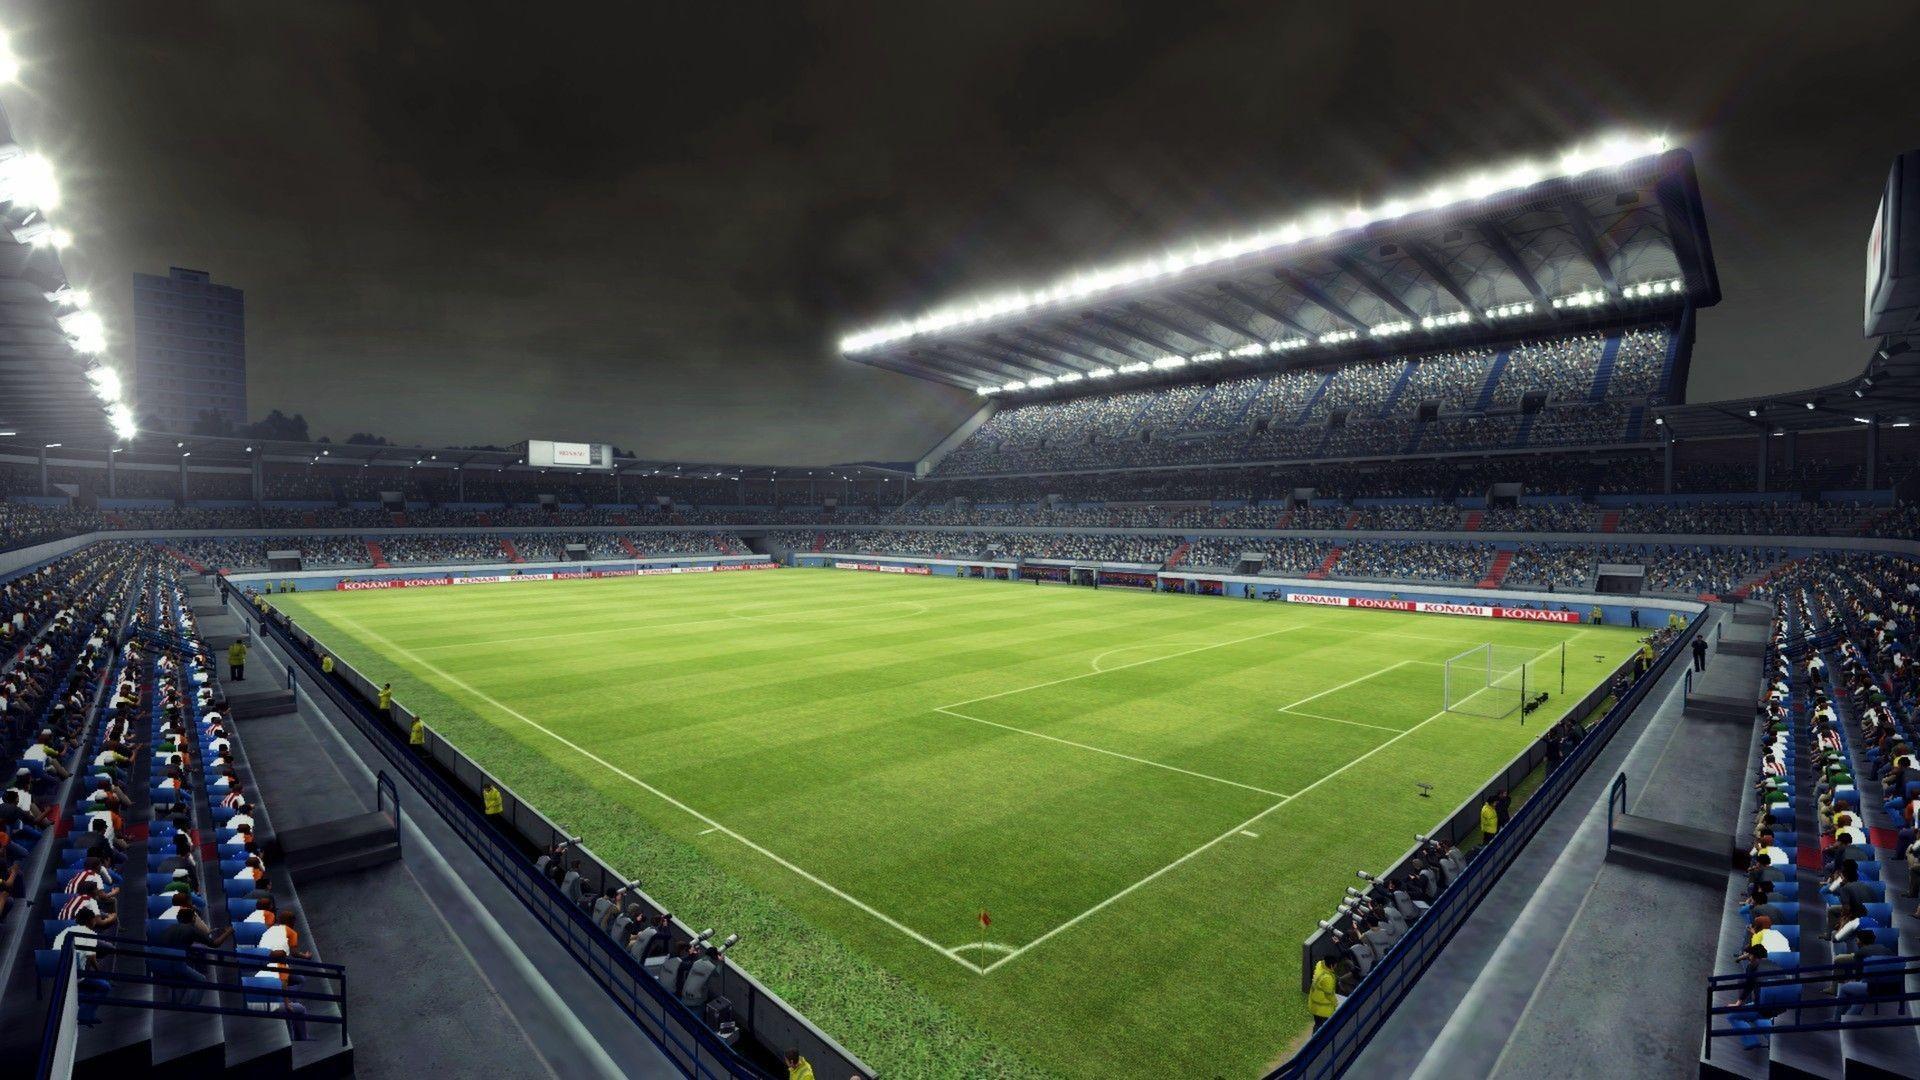 Full HD p Football Wallpapers HD, Desktop Backgrounds Football Field  Wallpapers Wallpapers)